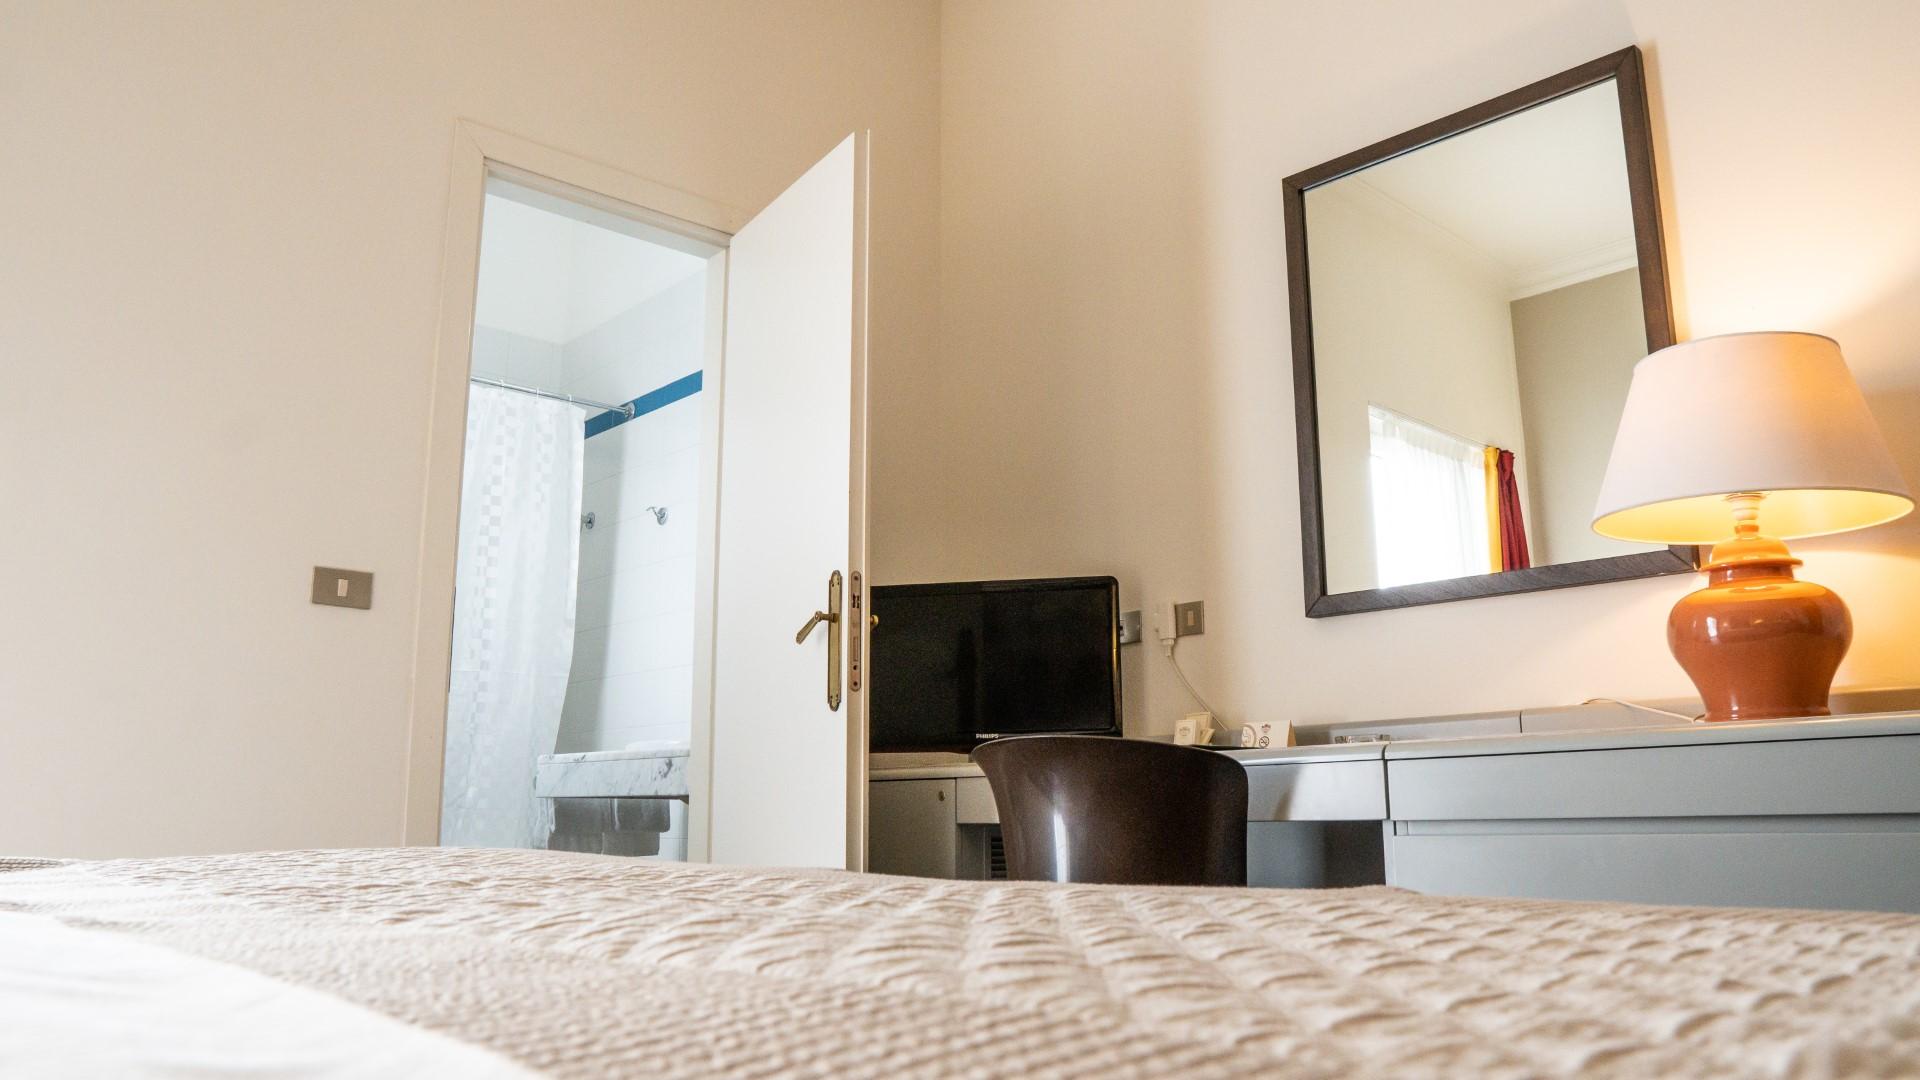 Camera Standard Family Hotel Principe Palace Piazza Mazzini Jesolo Lido VE